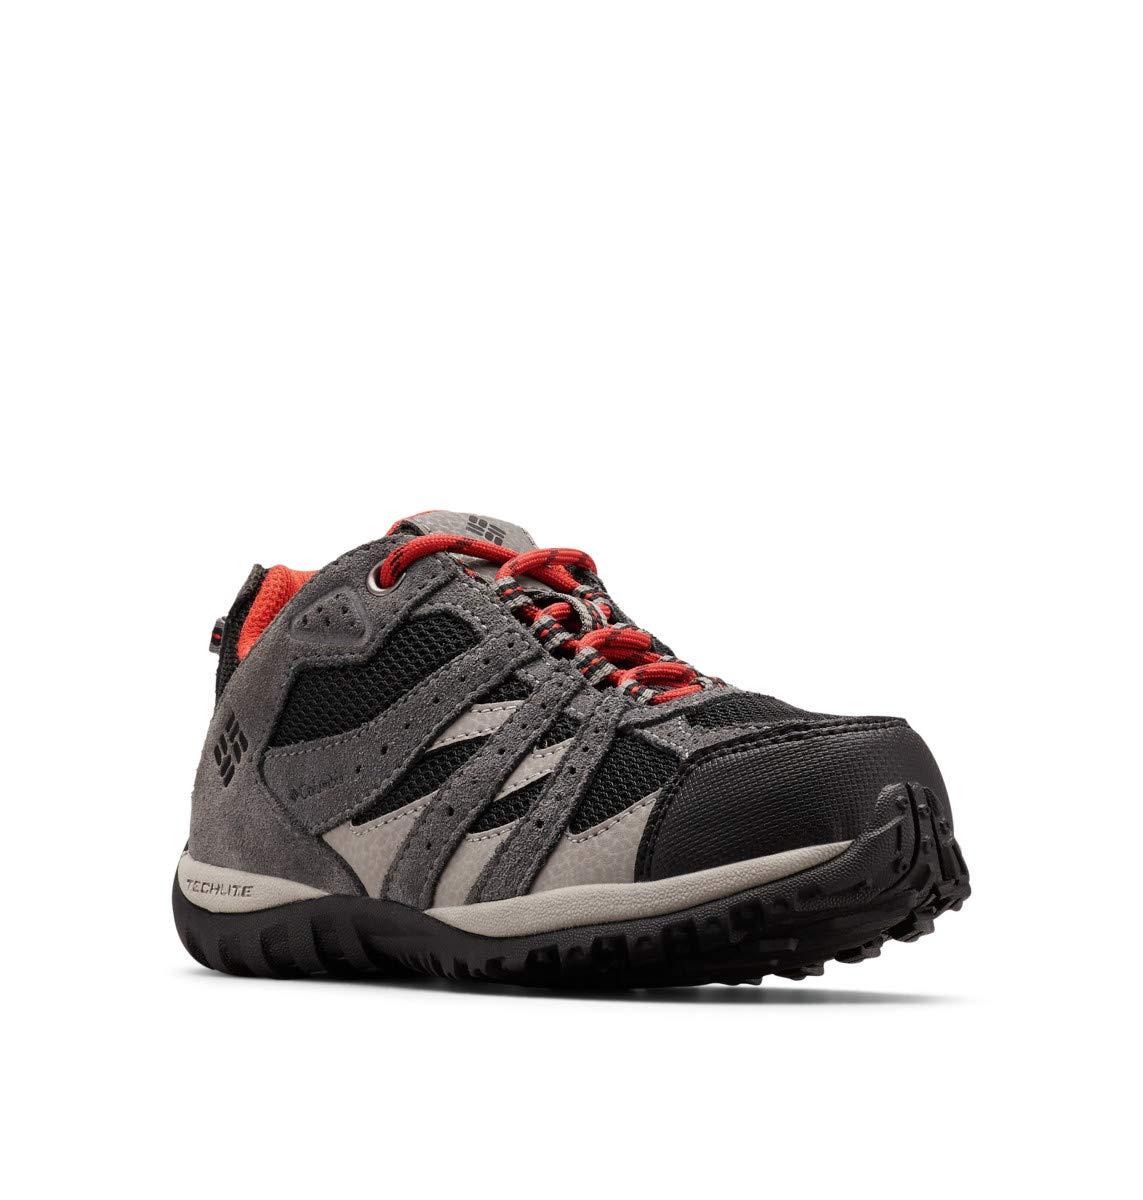 Columbia Unisex Childrens Redmond Waterproof Hiking Shoe, Black/Flame, 10 M US Little Kid by Columbia